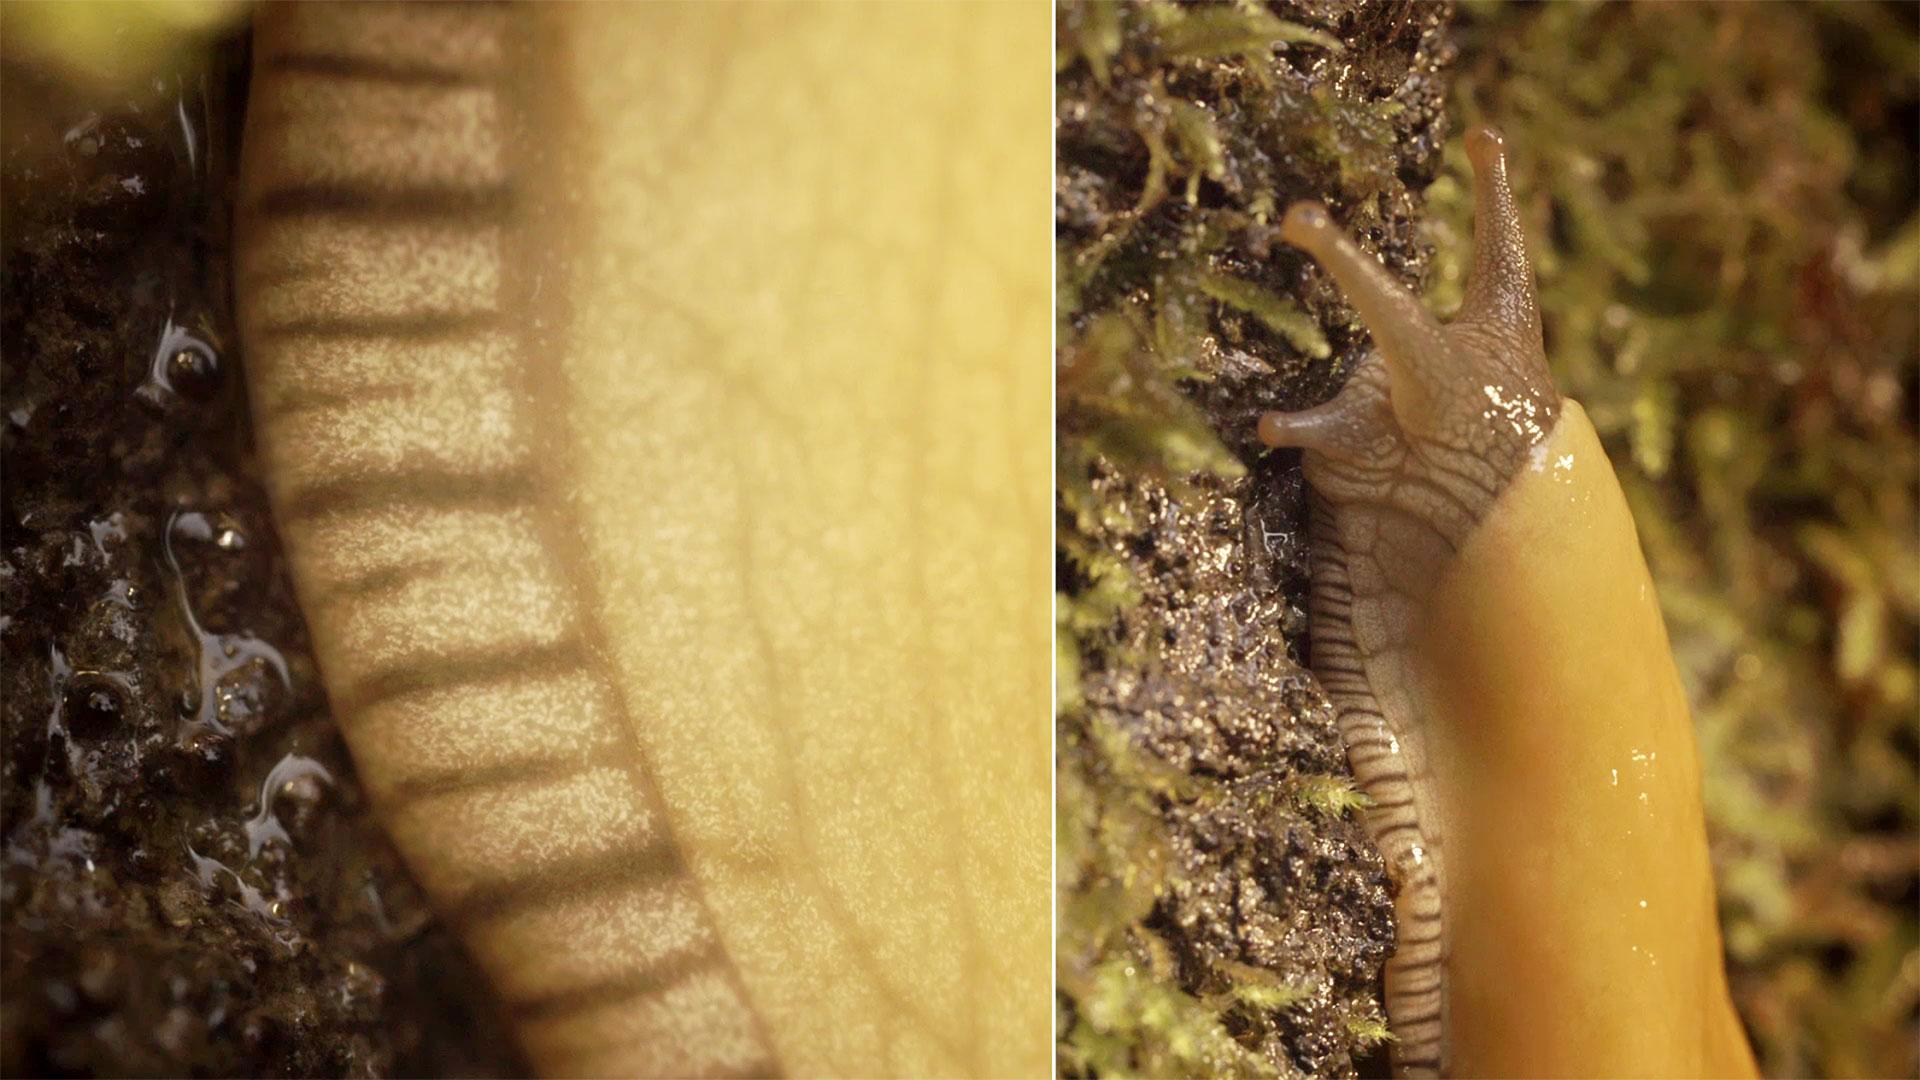 Banana Slugs: Secret of the Slime | Deep Look | KQED Science